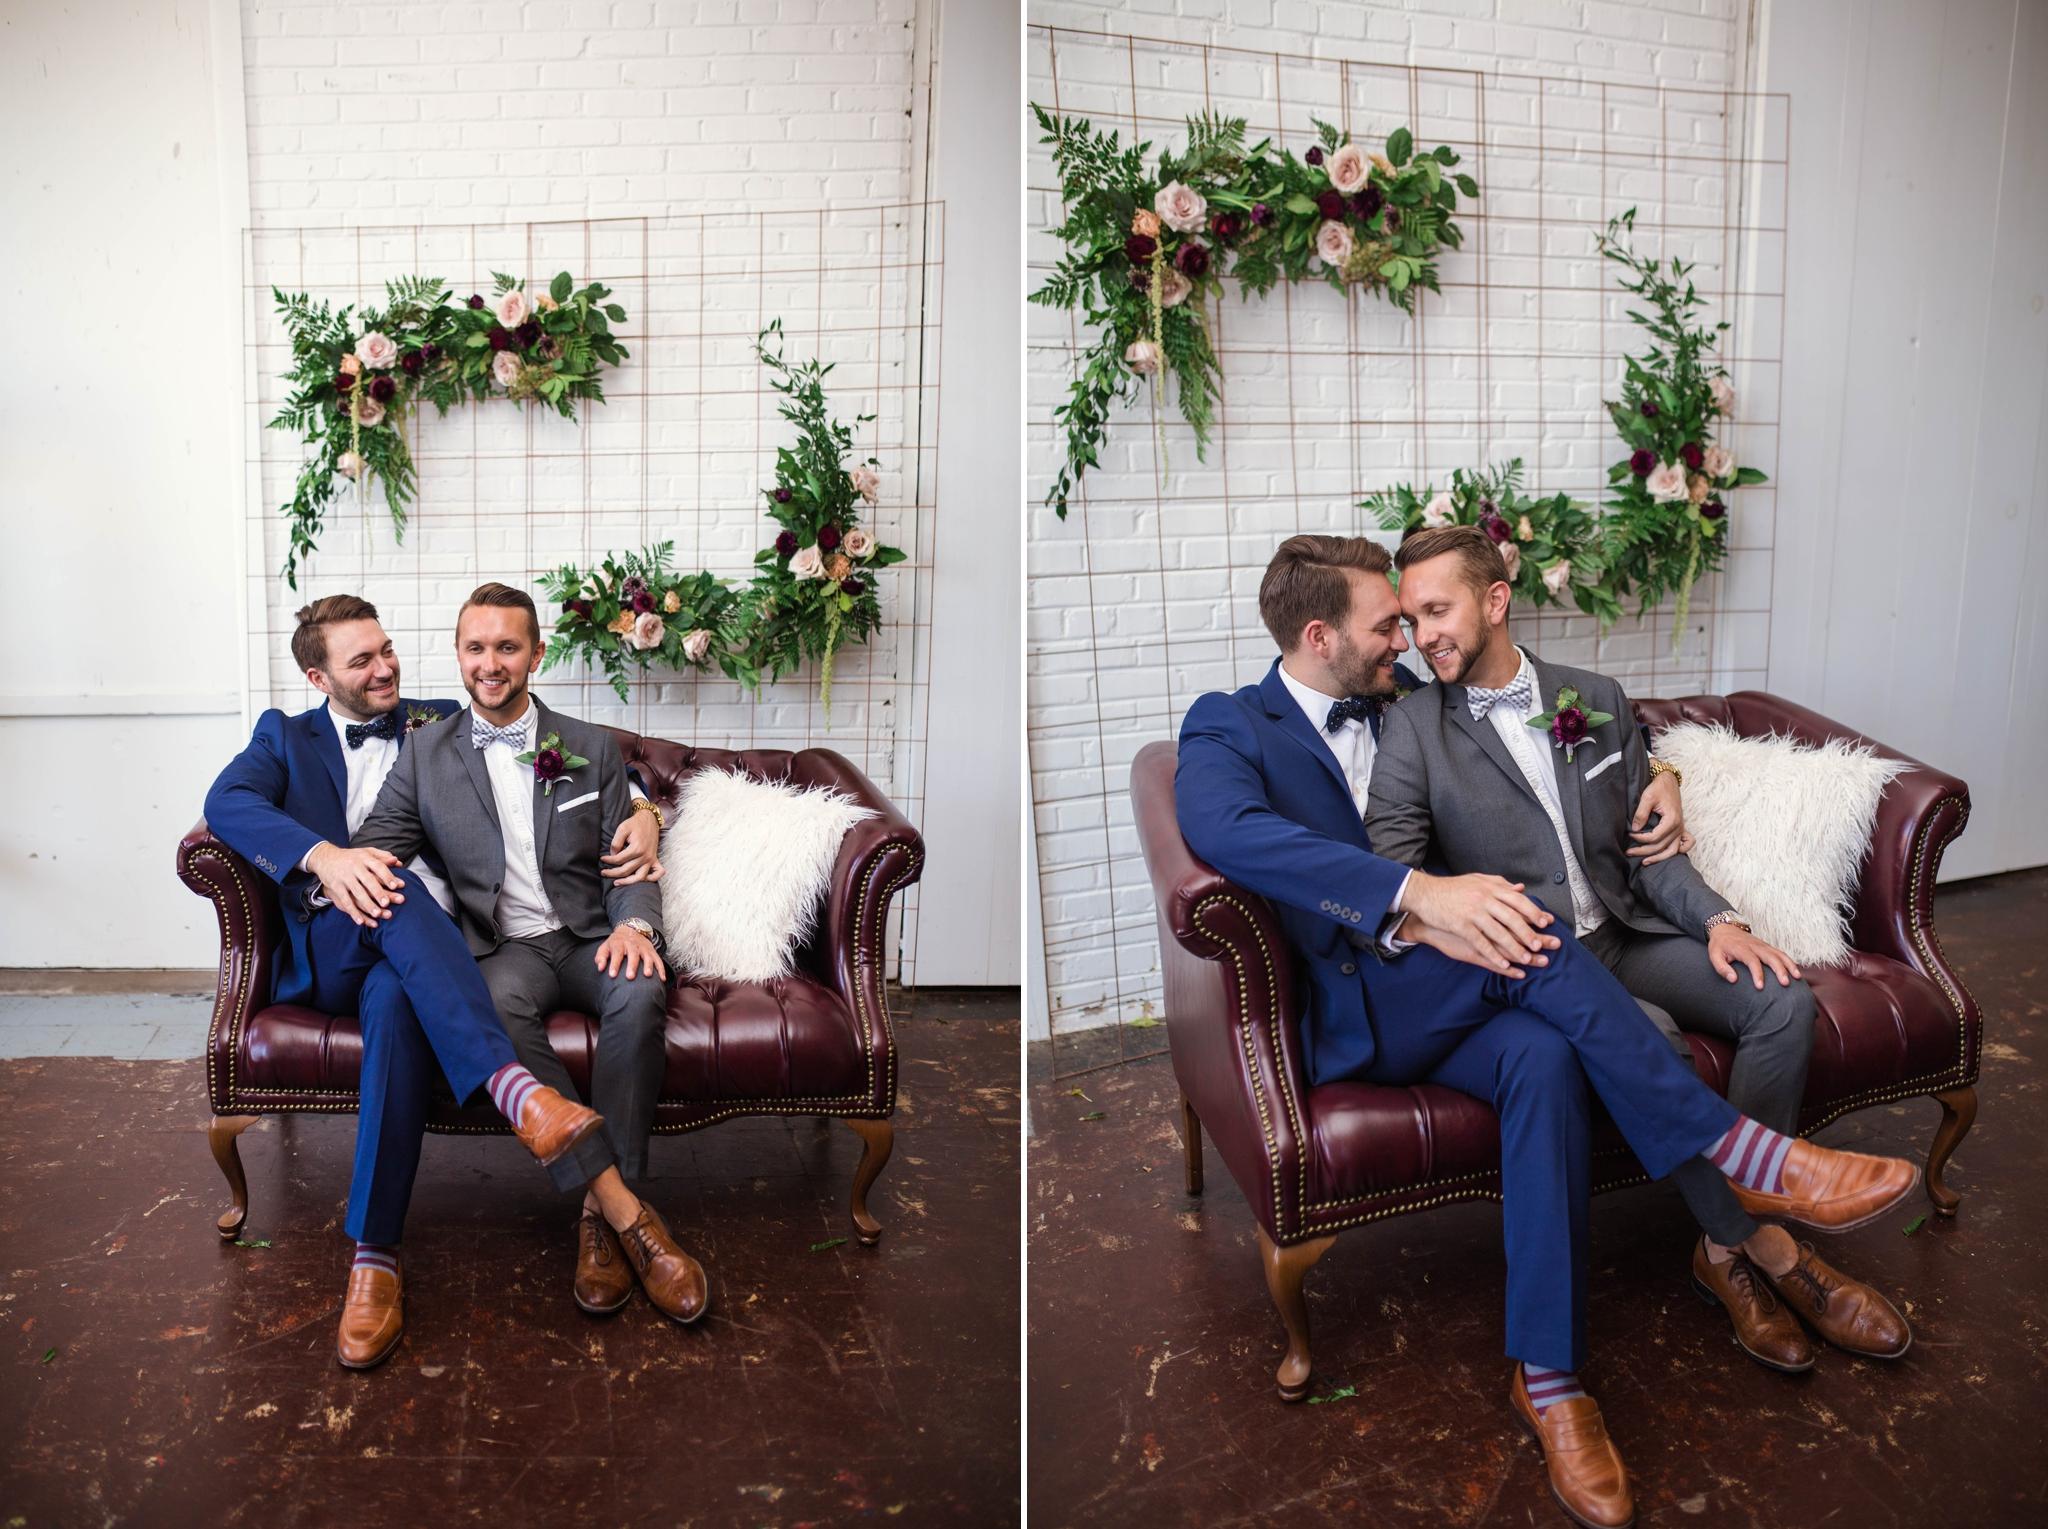 Gay and Lesbian friendly Wedding Photographer in Raleigh North Carolina - Johanna Dye Photography 8.jpg